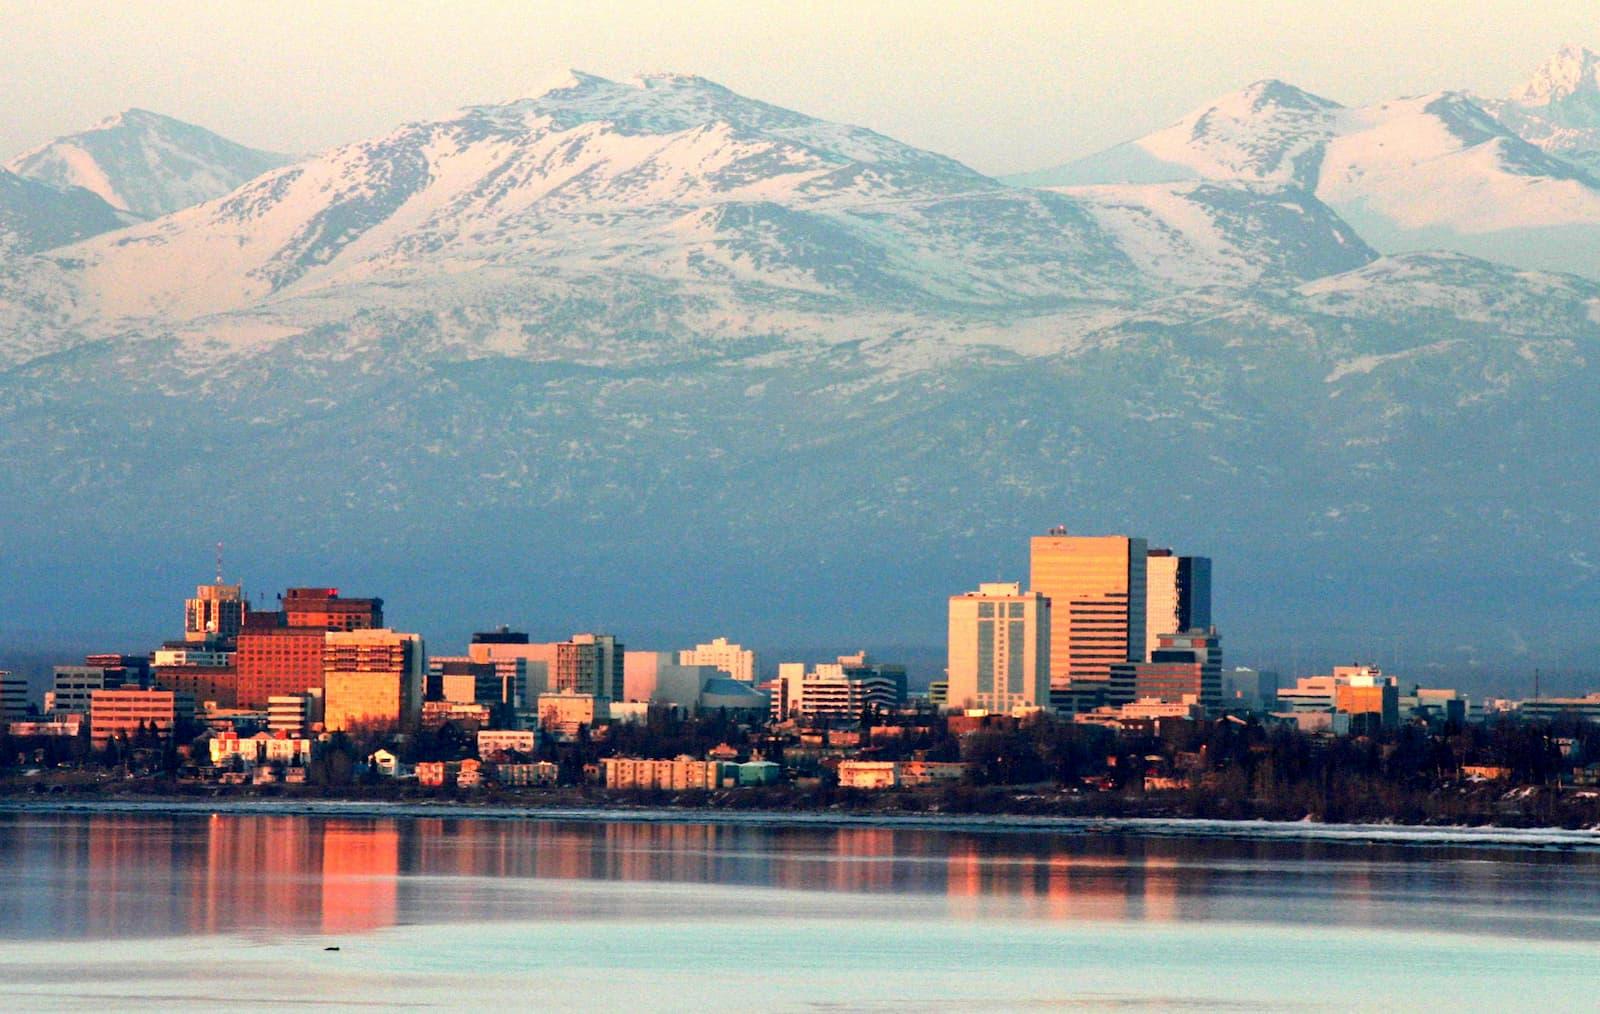 anchorage, Alaska, conversion therapy, ban